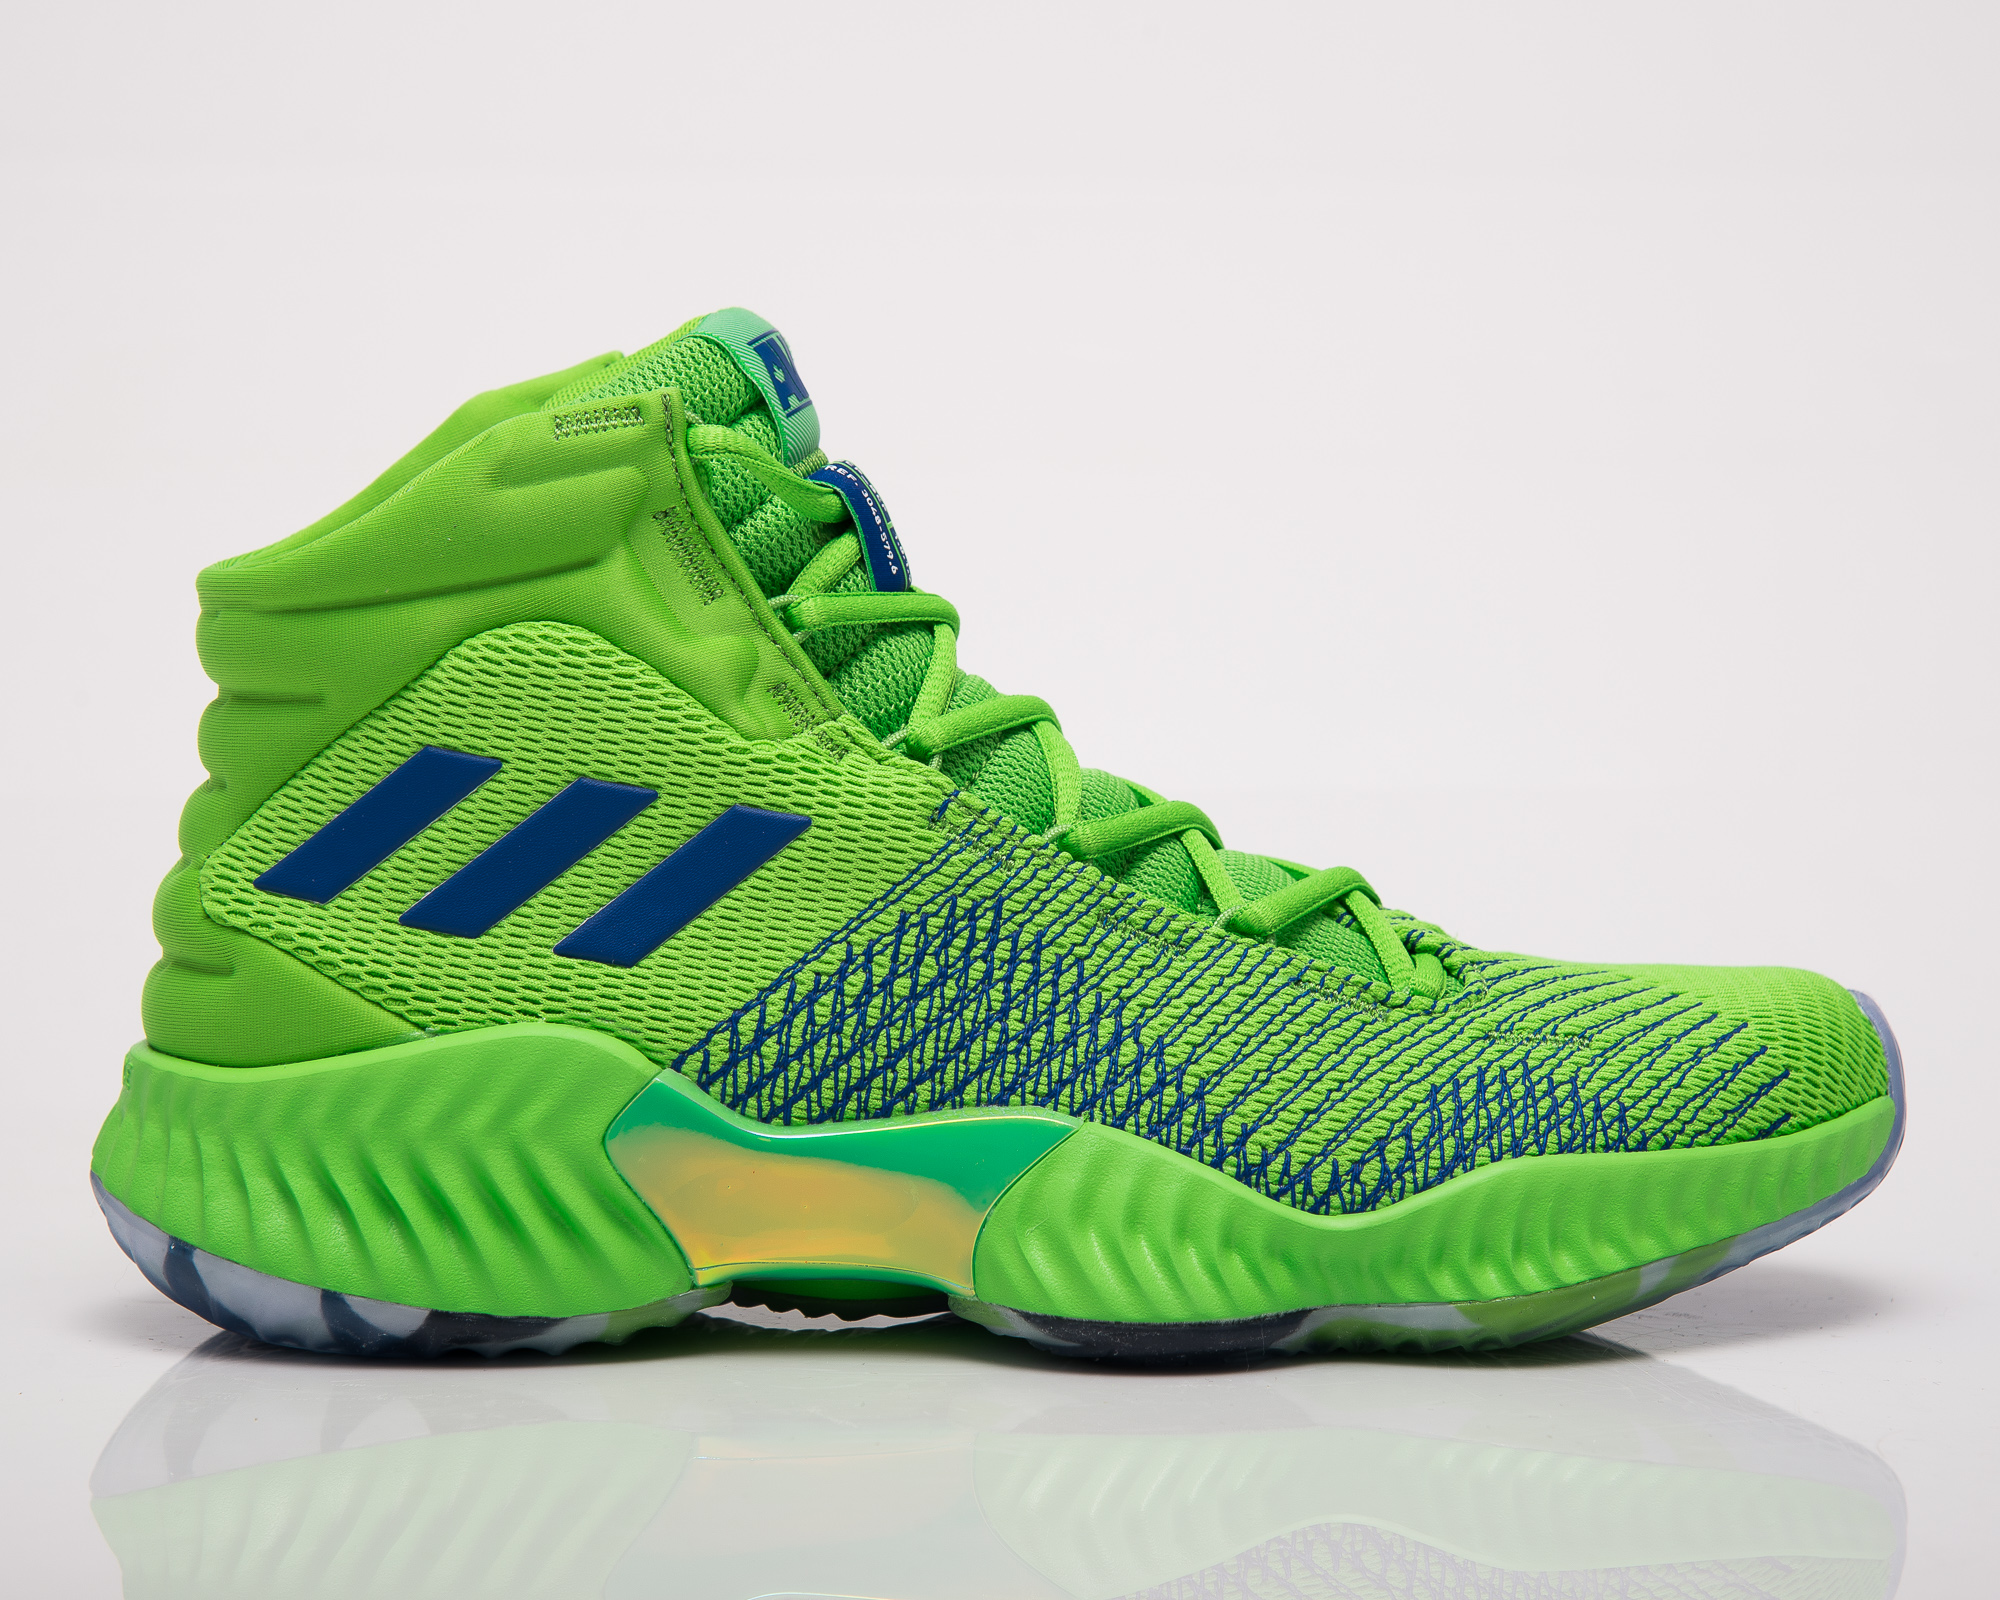 promo code f8633 70f32 adidas Pro Bounce 2018 Andrew Wiggins - BASKETBALL SHOES Adidas Basketball  Shoes - Superfanas.lt